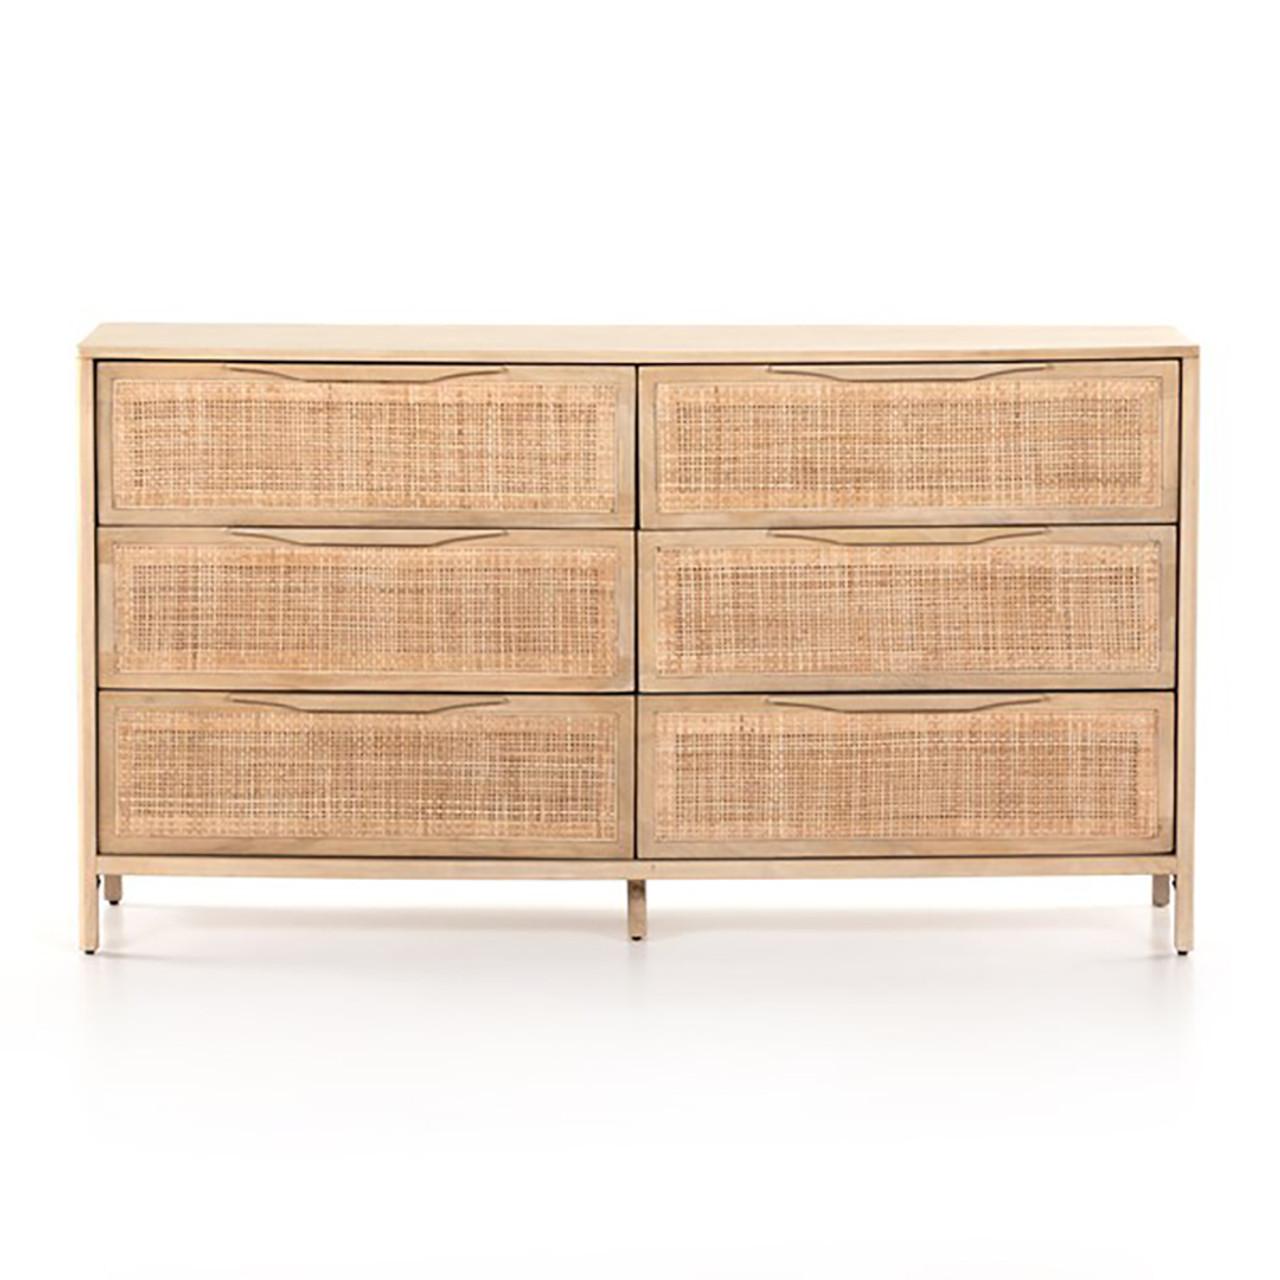 Bondi Cane 6 Drawer Dresser